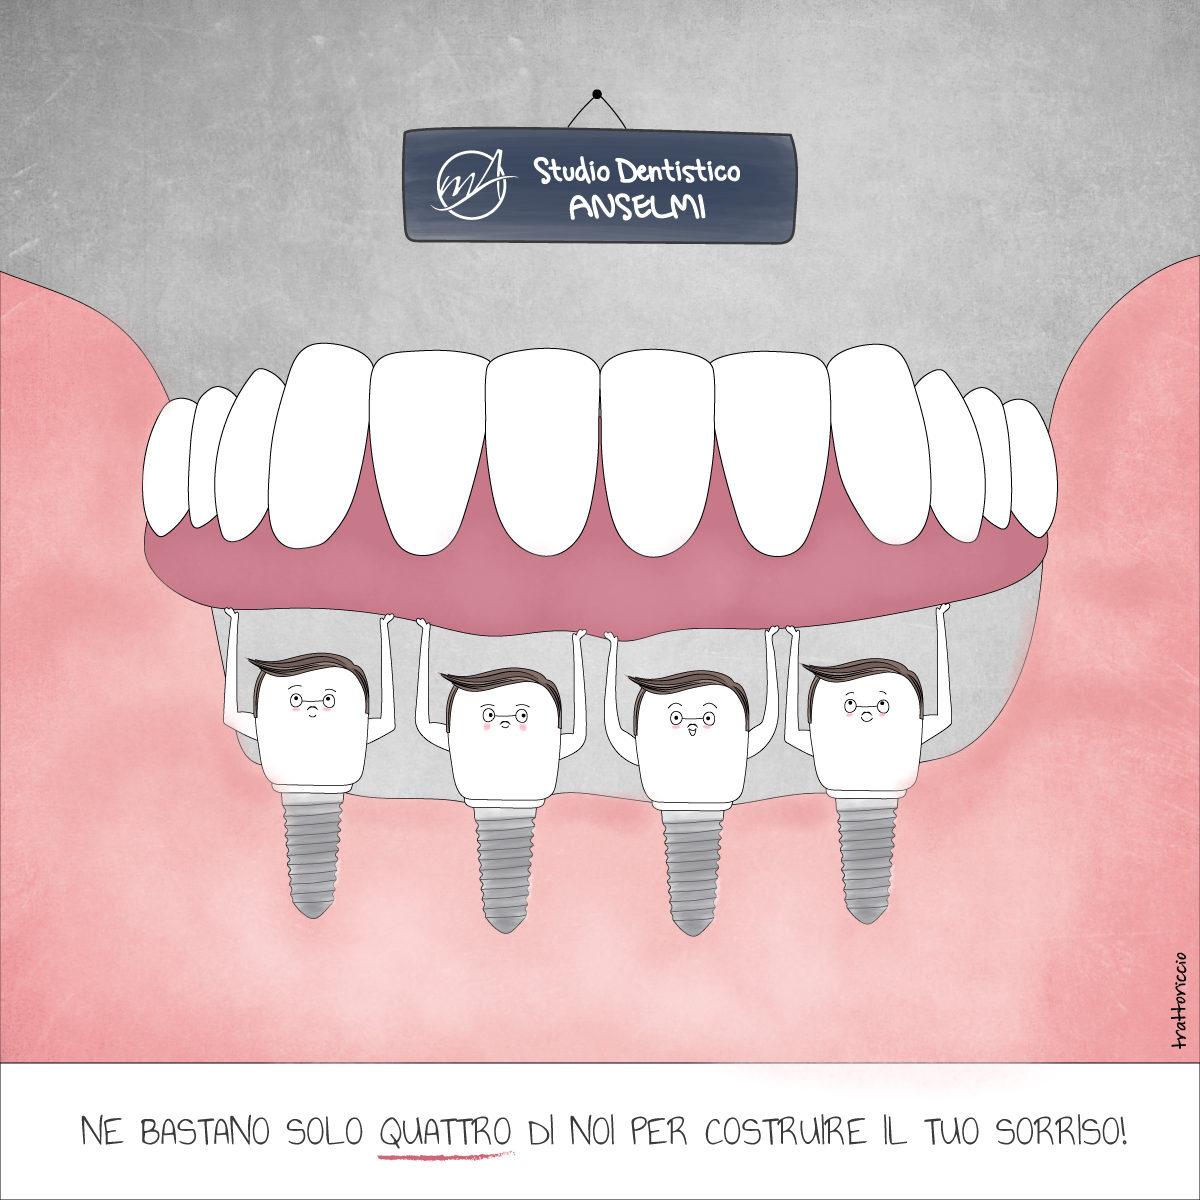 Toothie_Aprile_Implantologia_Carico_Immediato-1200x1200.jpg